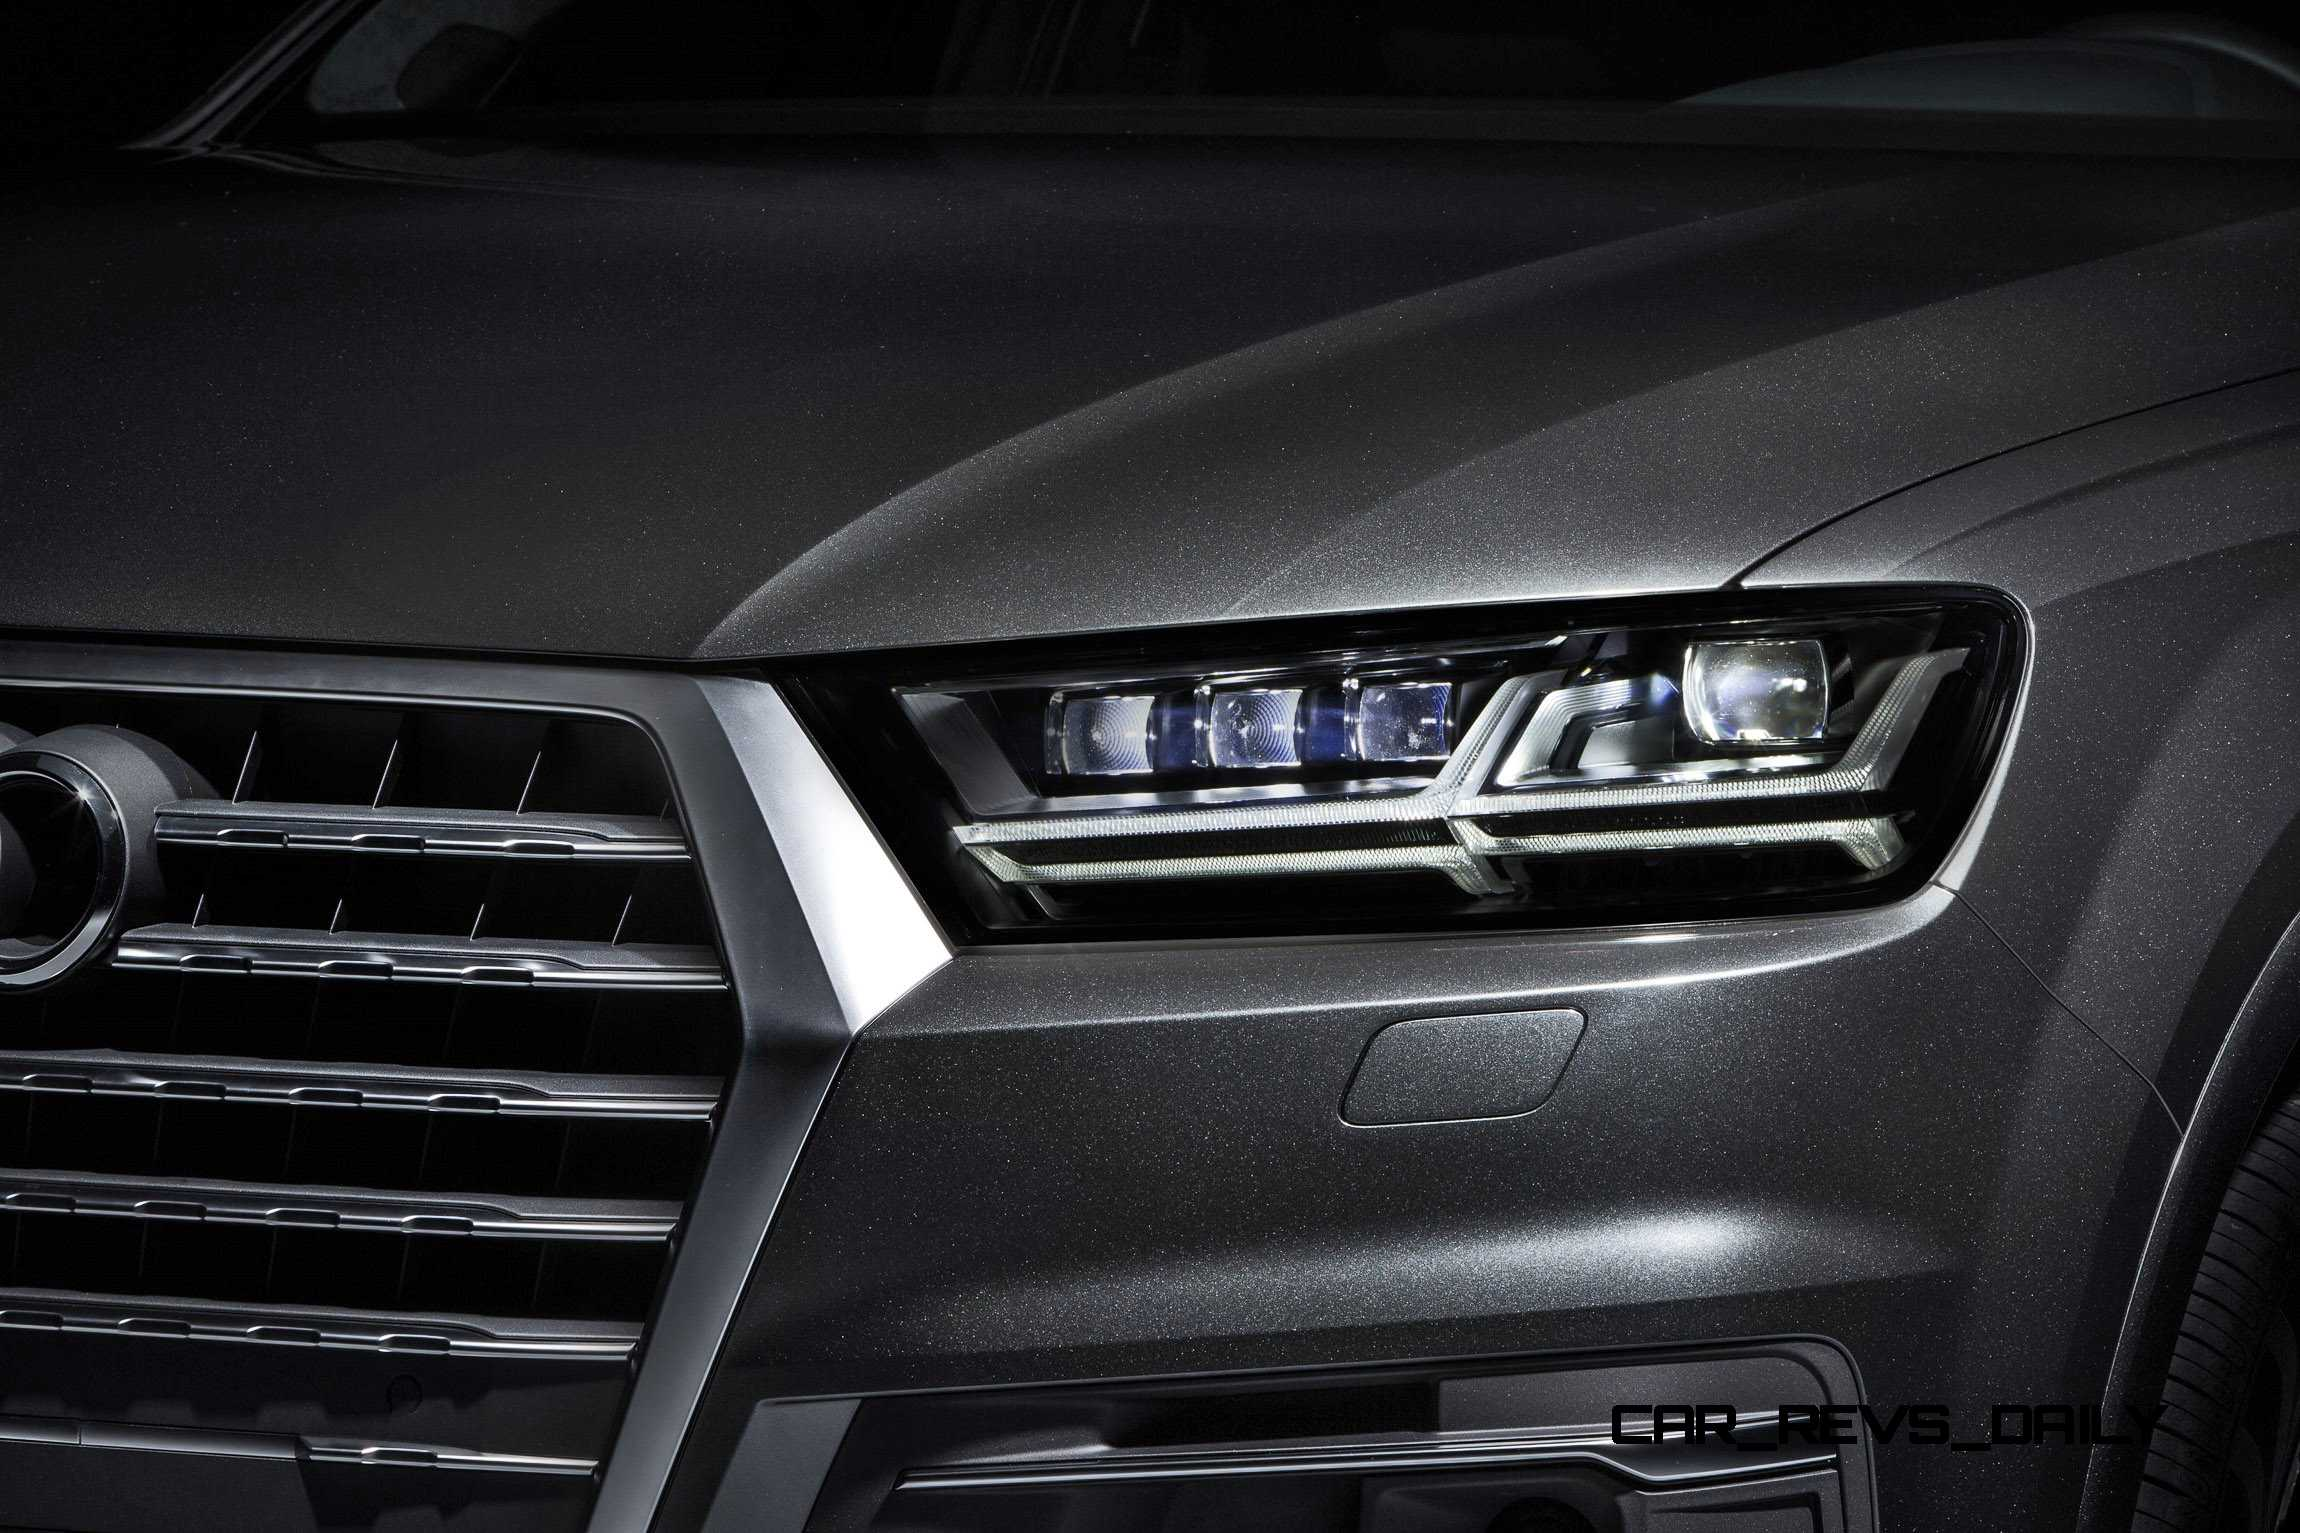 2016 Audi Q7 E Tron 3 0 Tdi Quattro